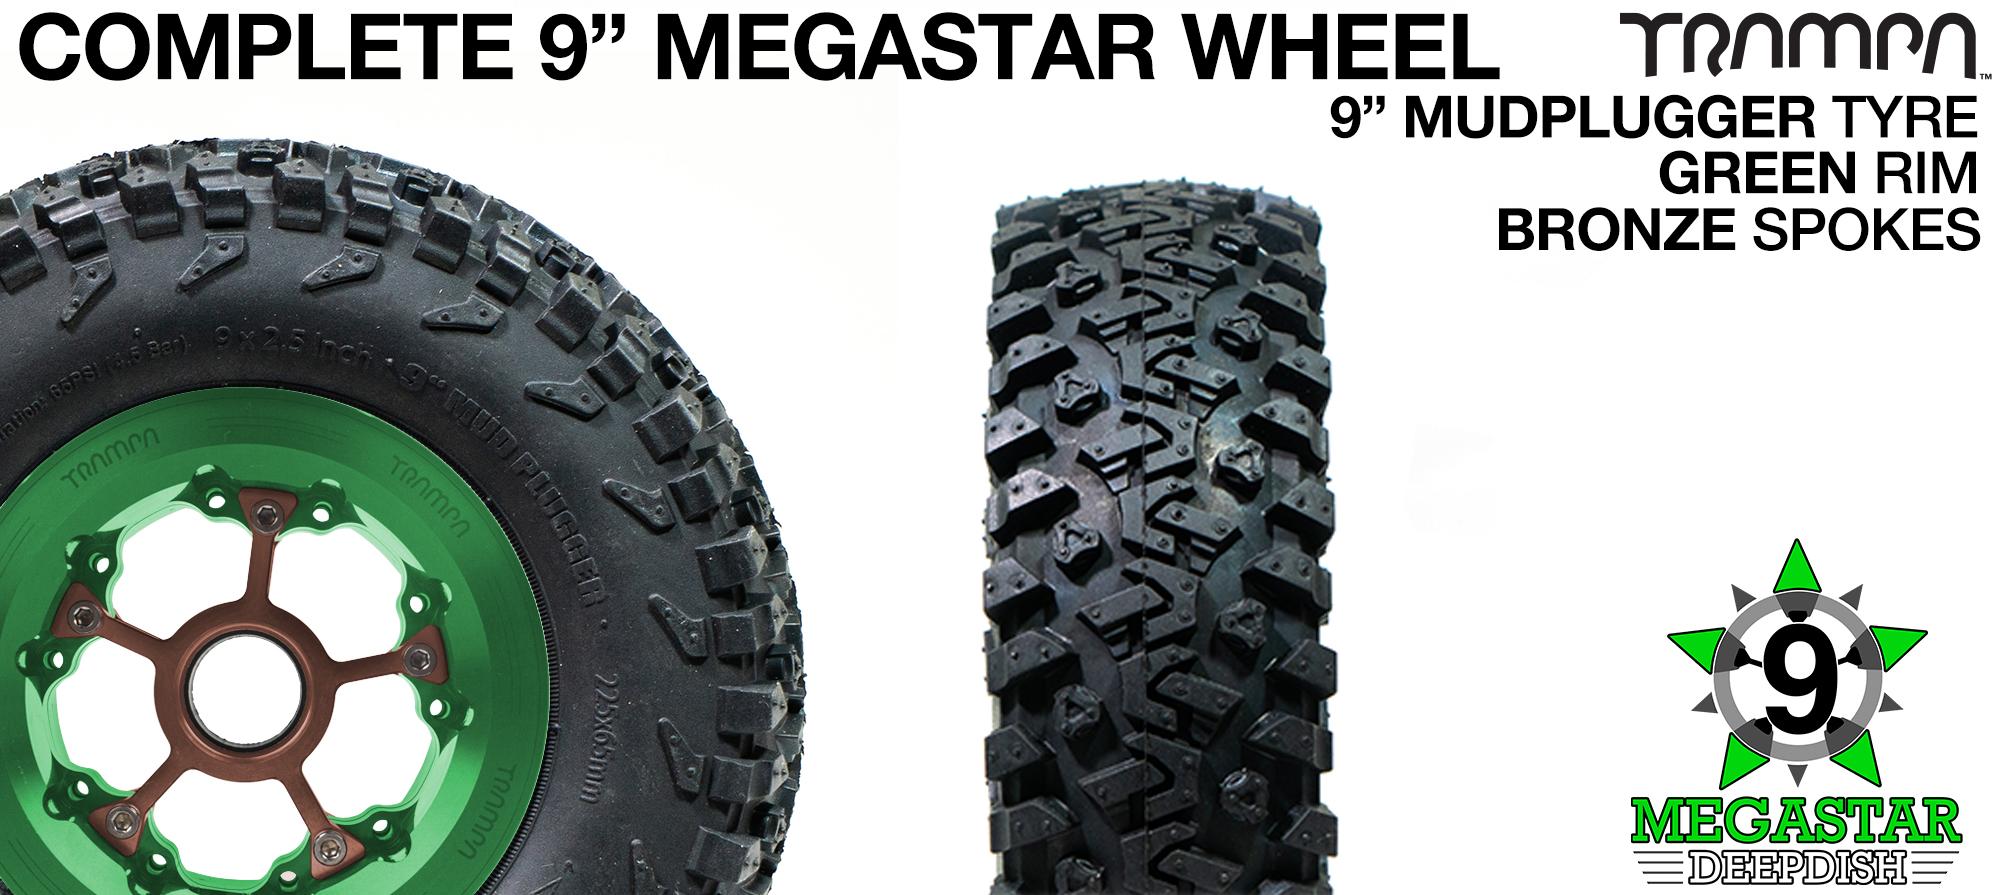 GREEN 9 inch Deep-Dish MEGASTARS Rim with BRONZE Spokes & 9 Inch MUDPLUGGER Tyre